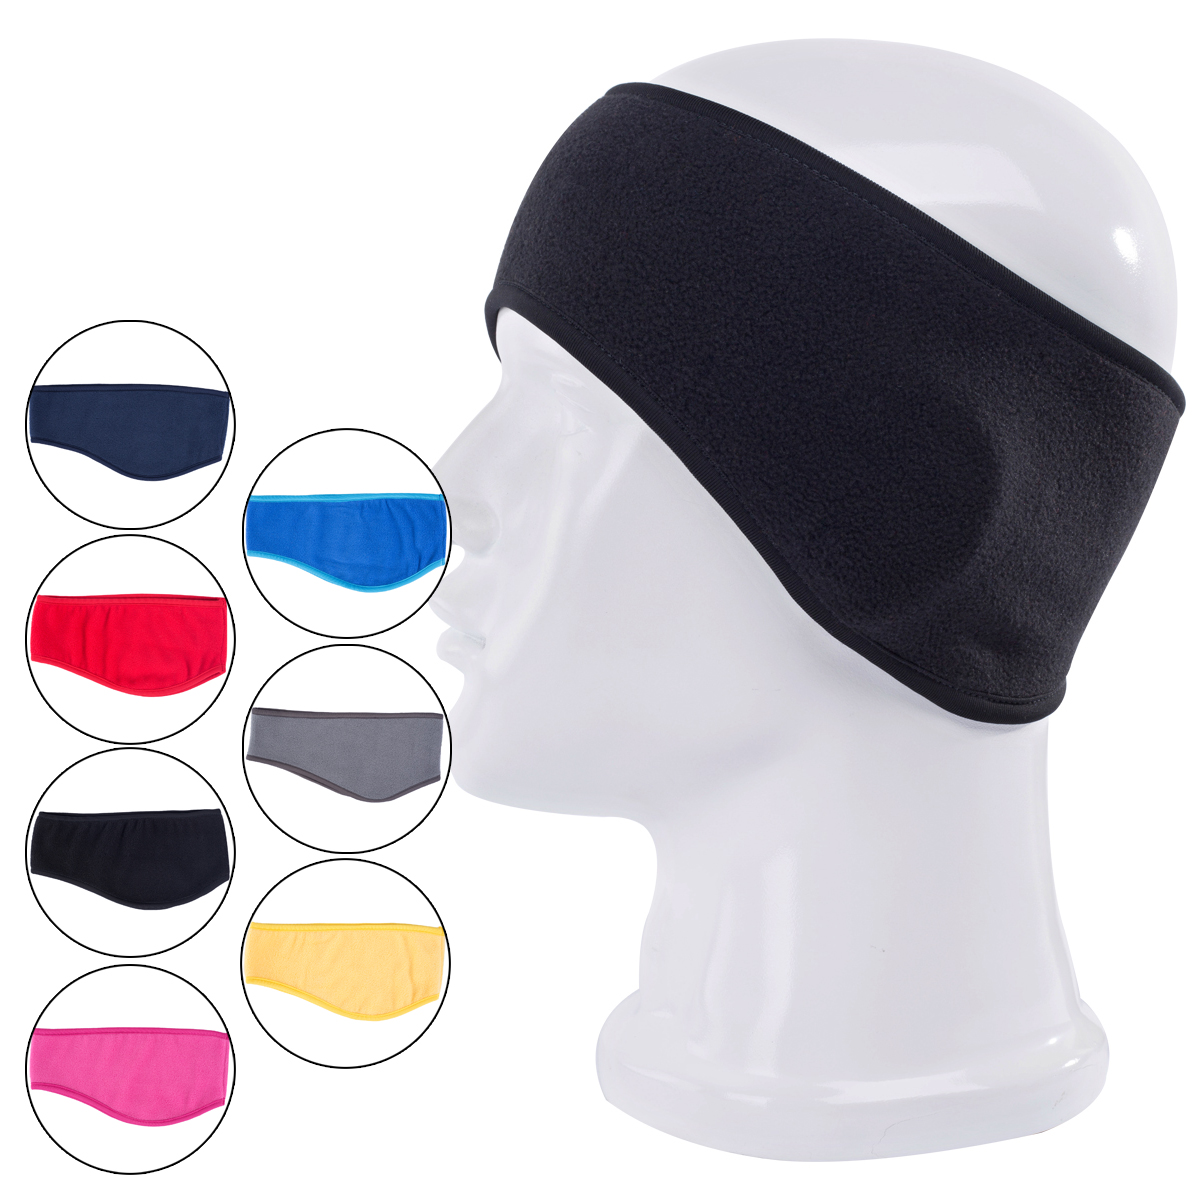 Unisex Women Men Headwear Ear Warm Winter Head Band Polar Fleece Ski Ear Muff Stretch Spandex Hair Band Accessories(China (Mainland))